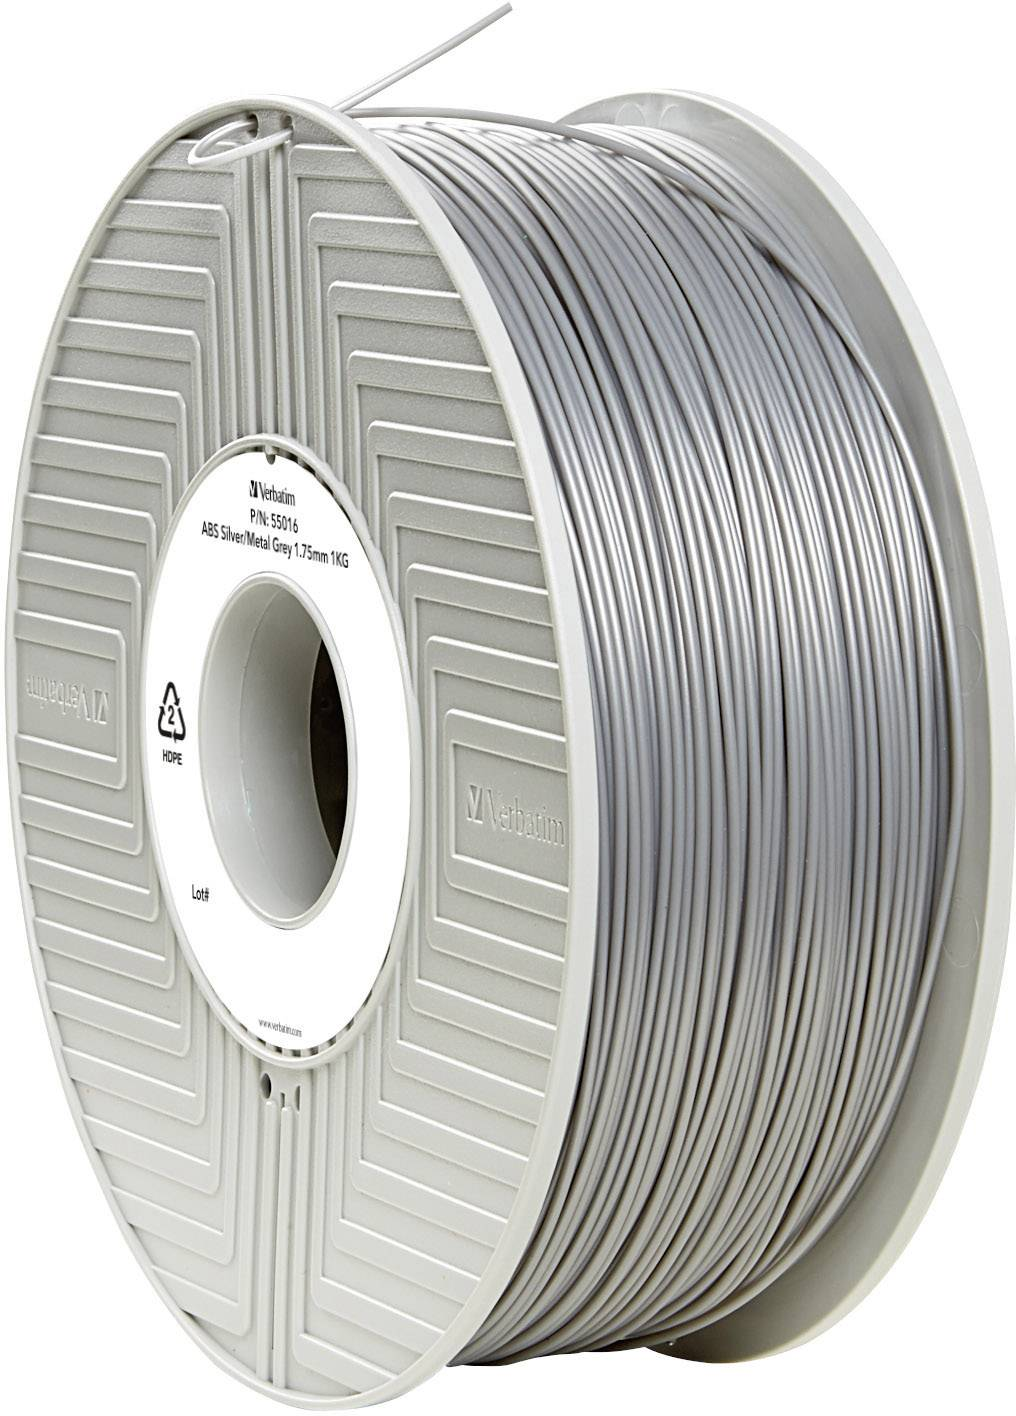 Vlákno pro 3D tiskárny Verbatim 55016, ABS plast, 1.75 mm, 1 kg, stříbrná (matná)